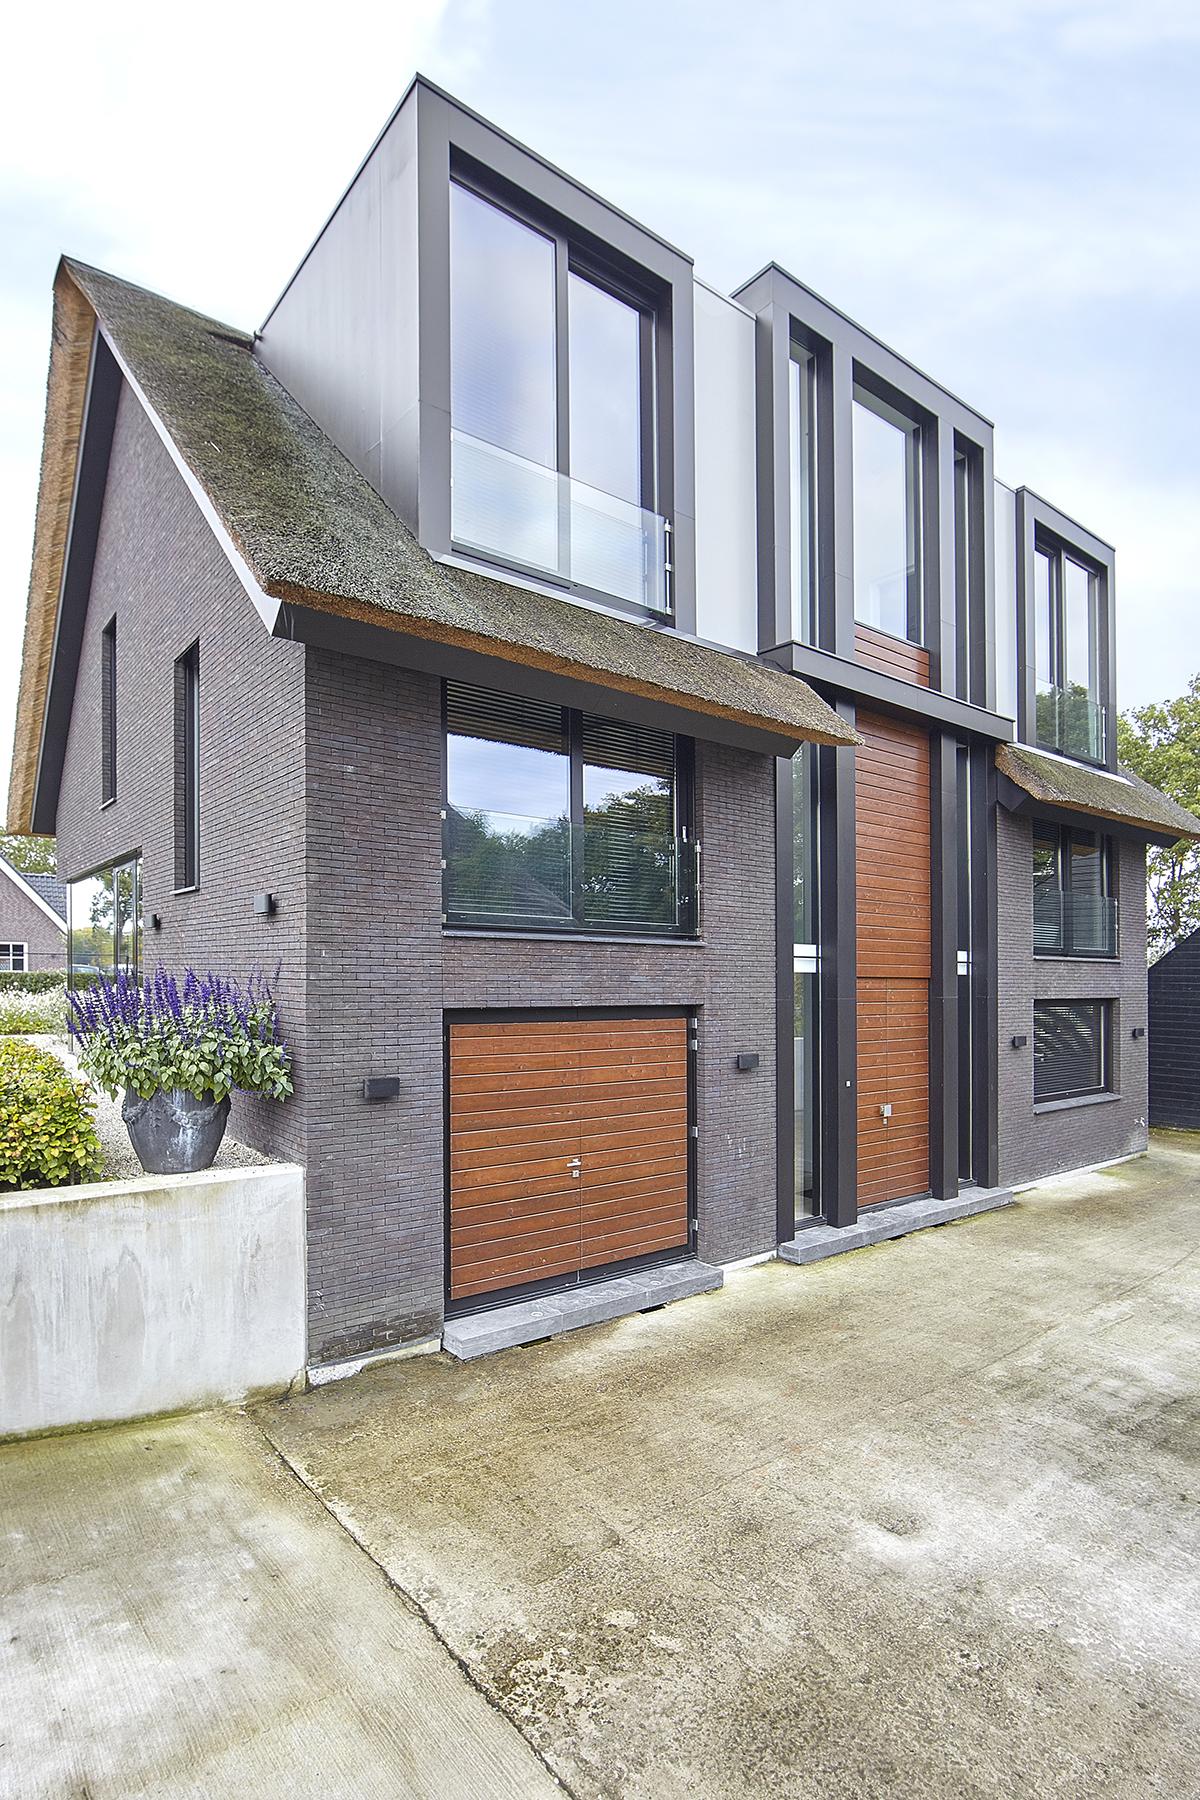 Exterieur, entree, oprit, garage, villa, Bob Manders